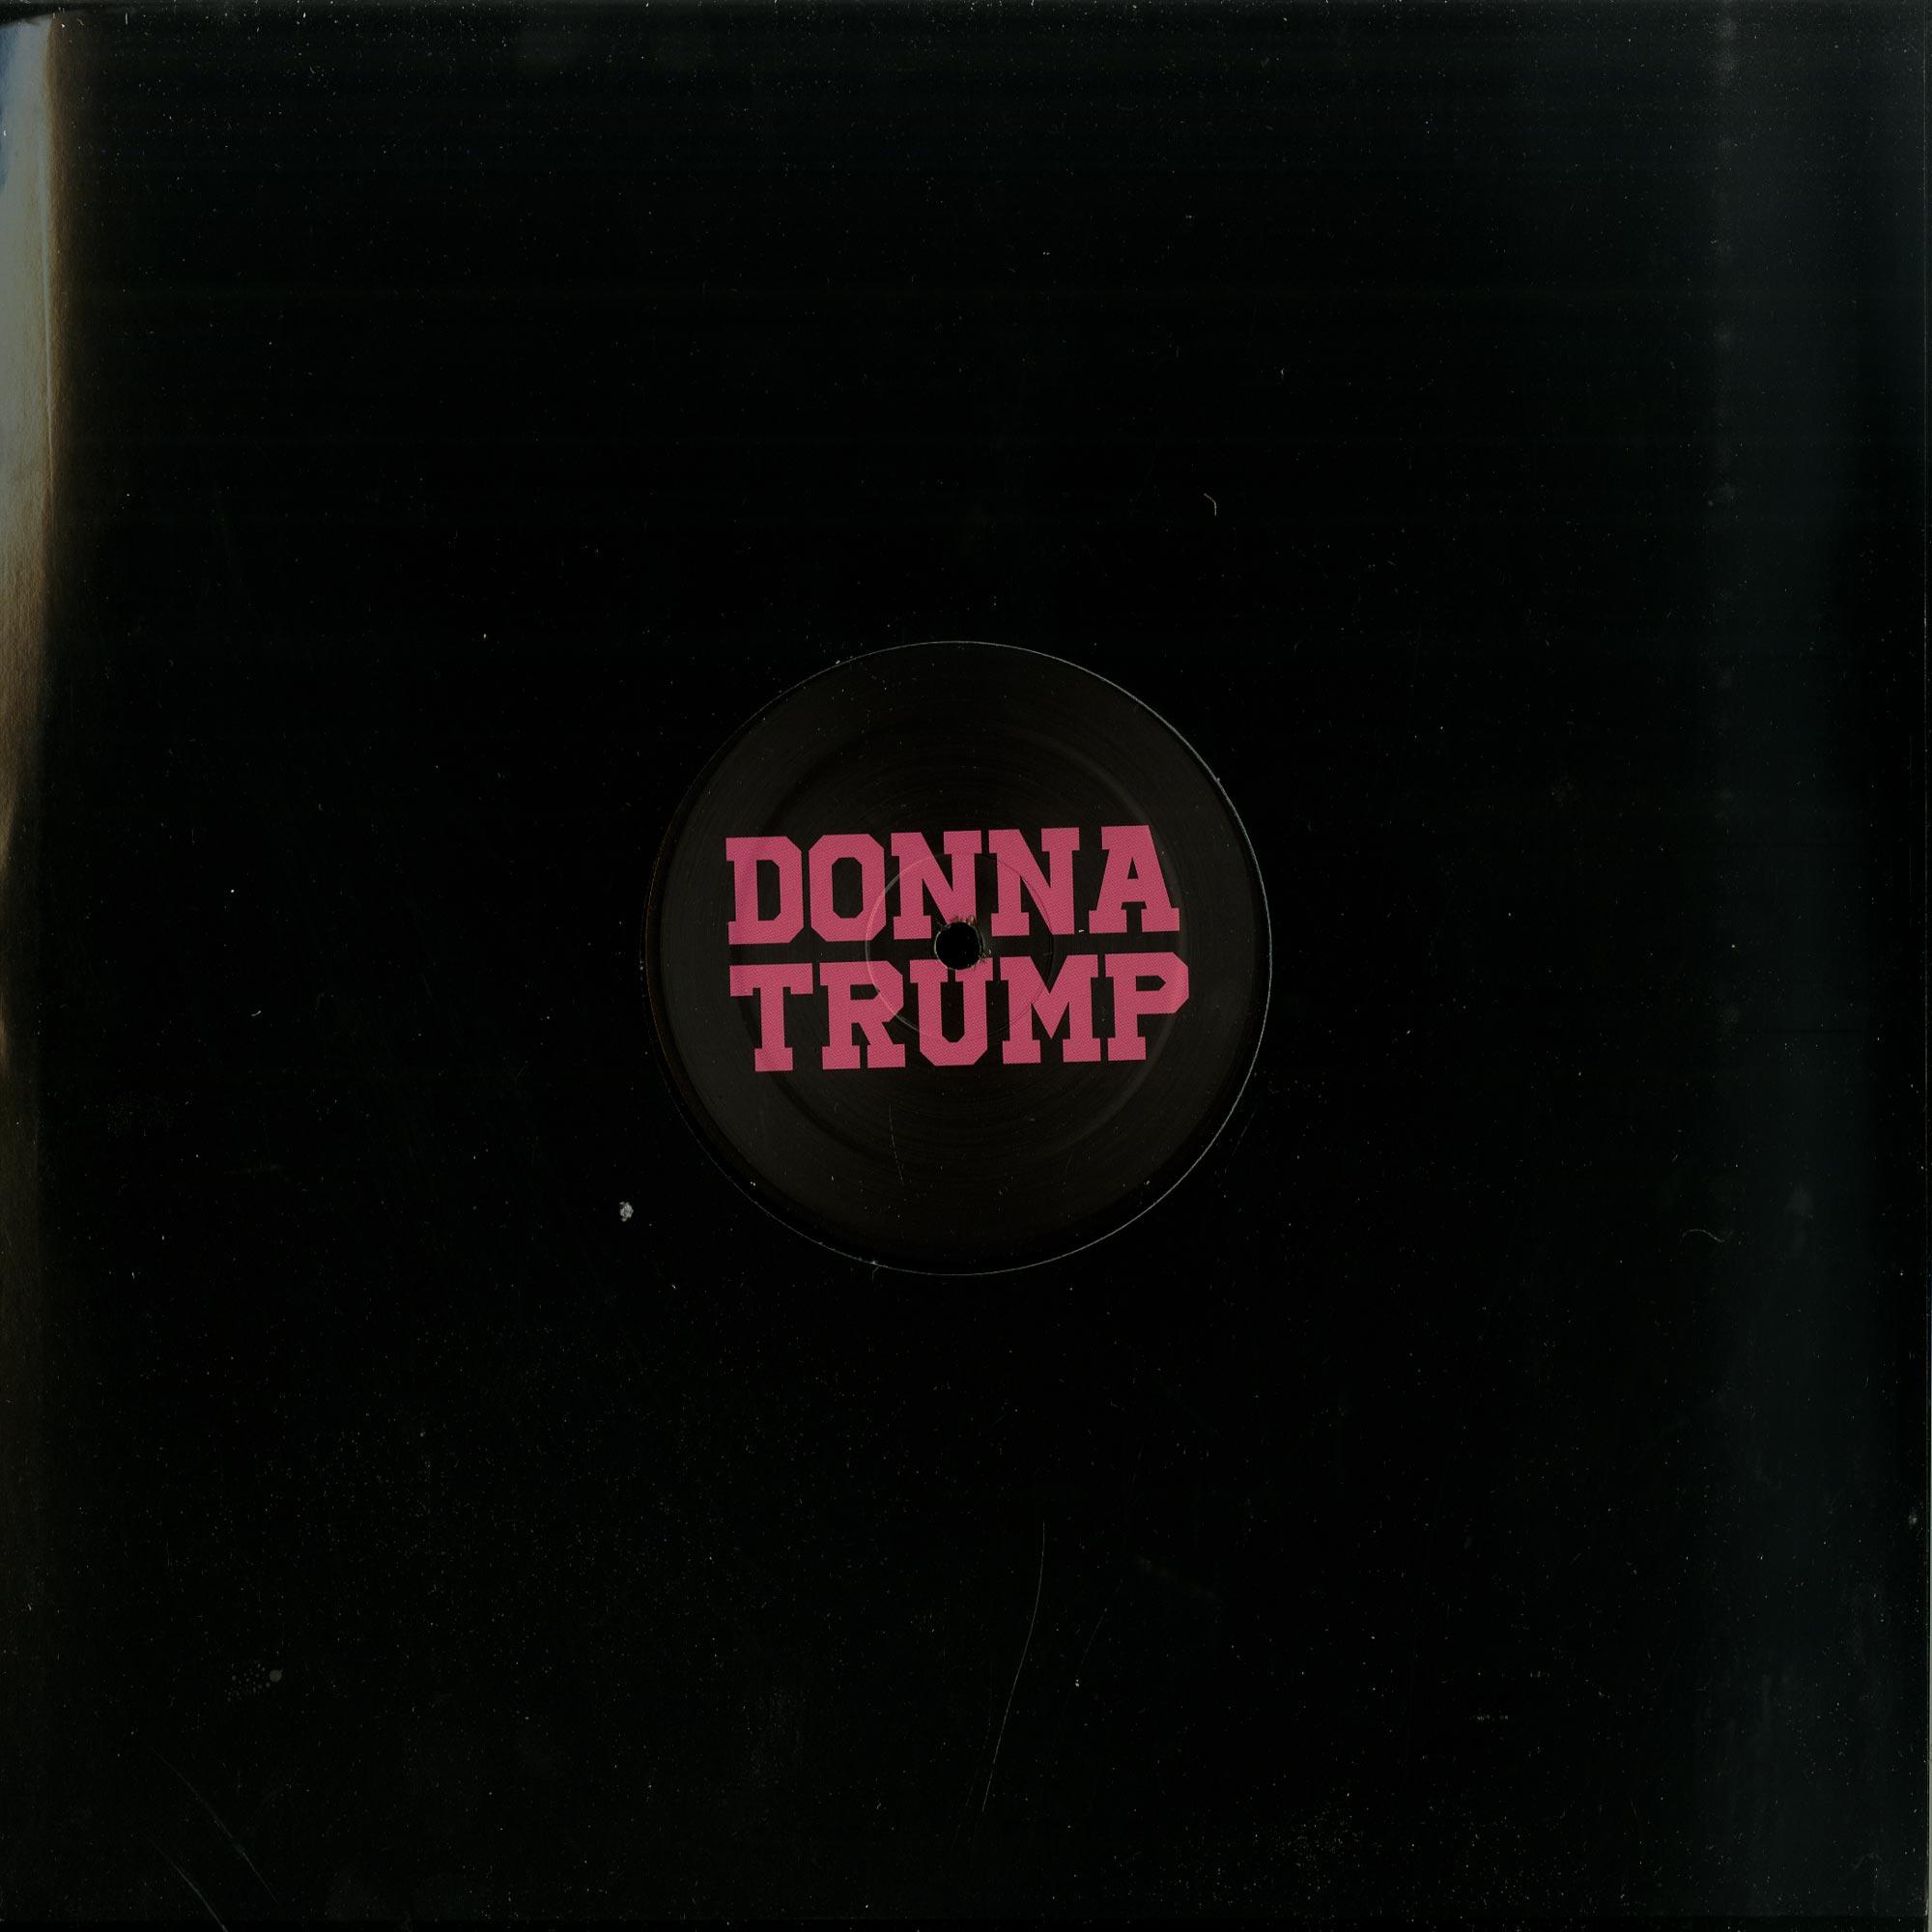 Donna Trump - DONNA TRUMP